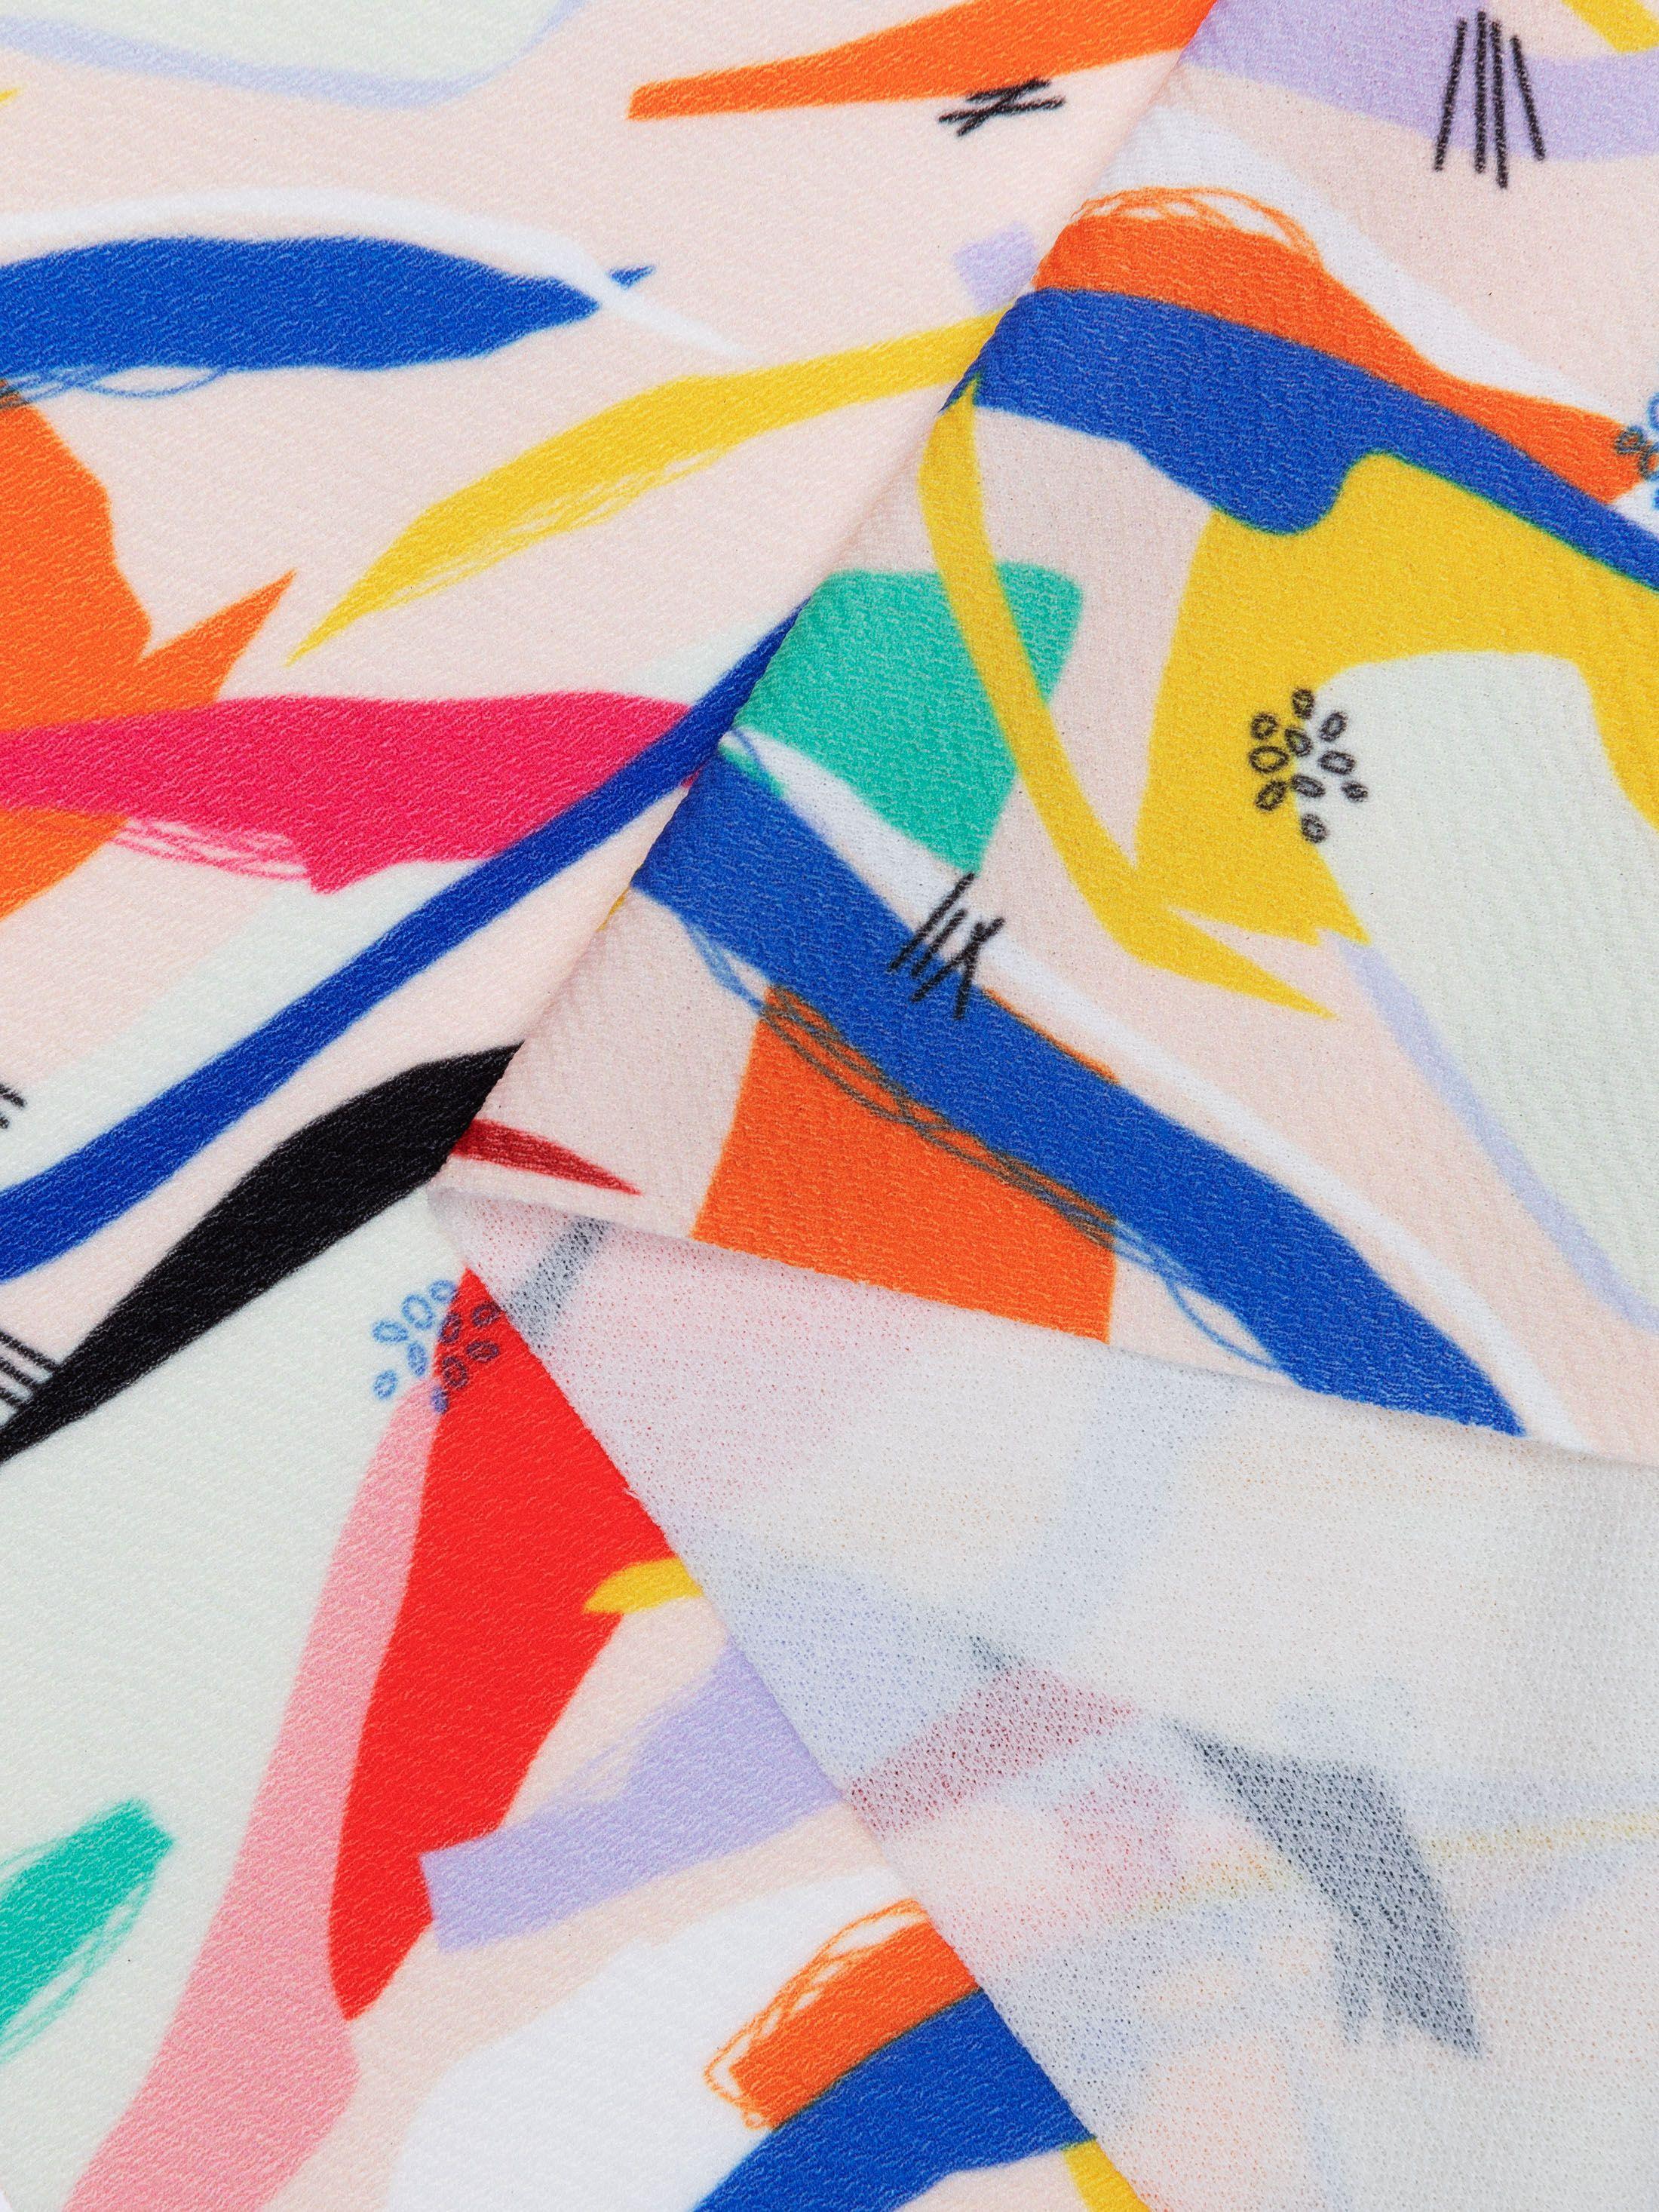 impresión textil en tela crepé elástico